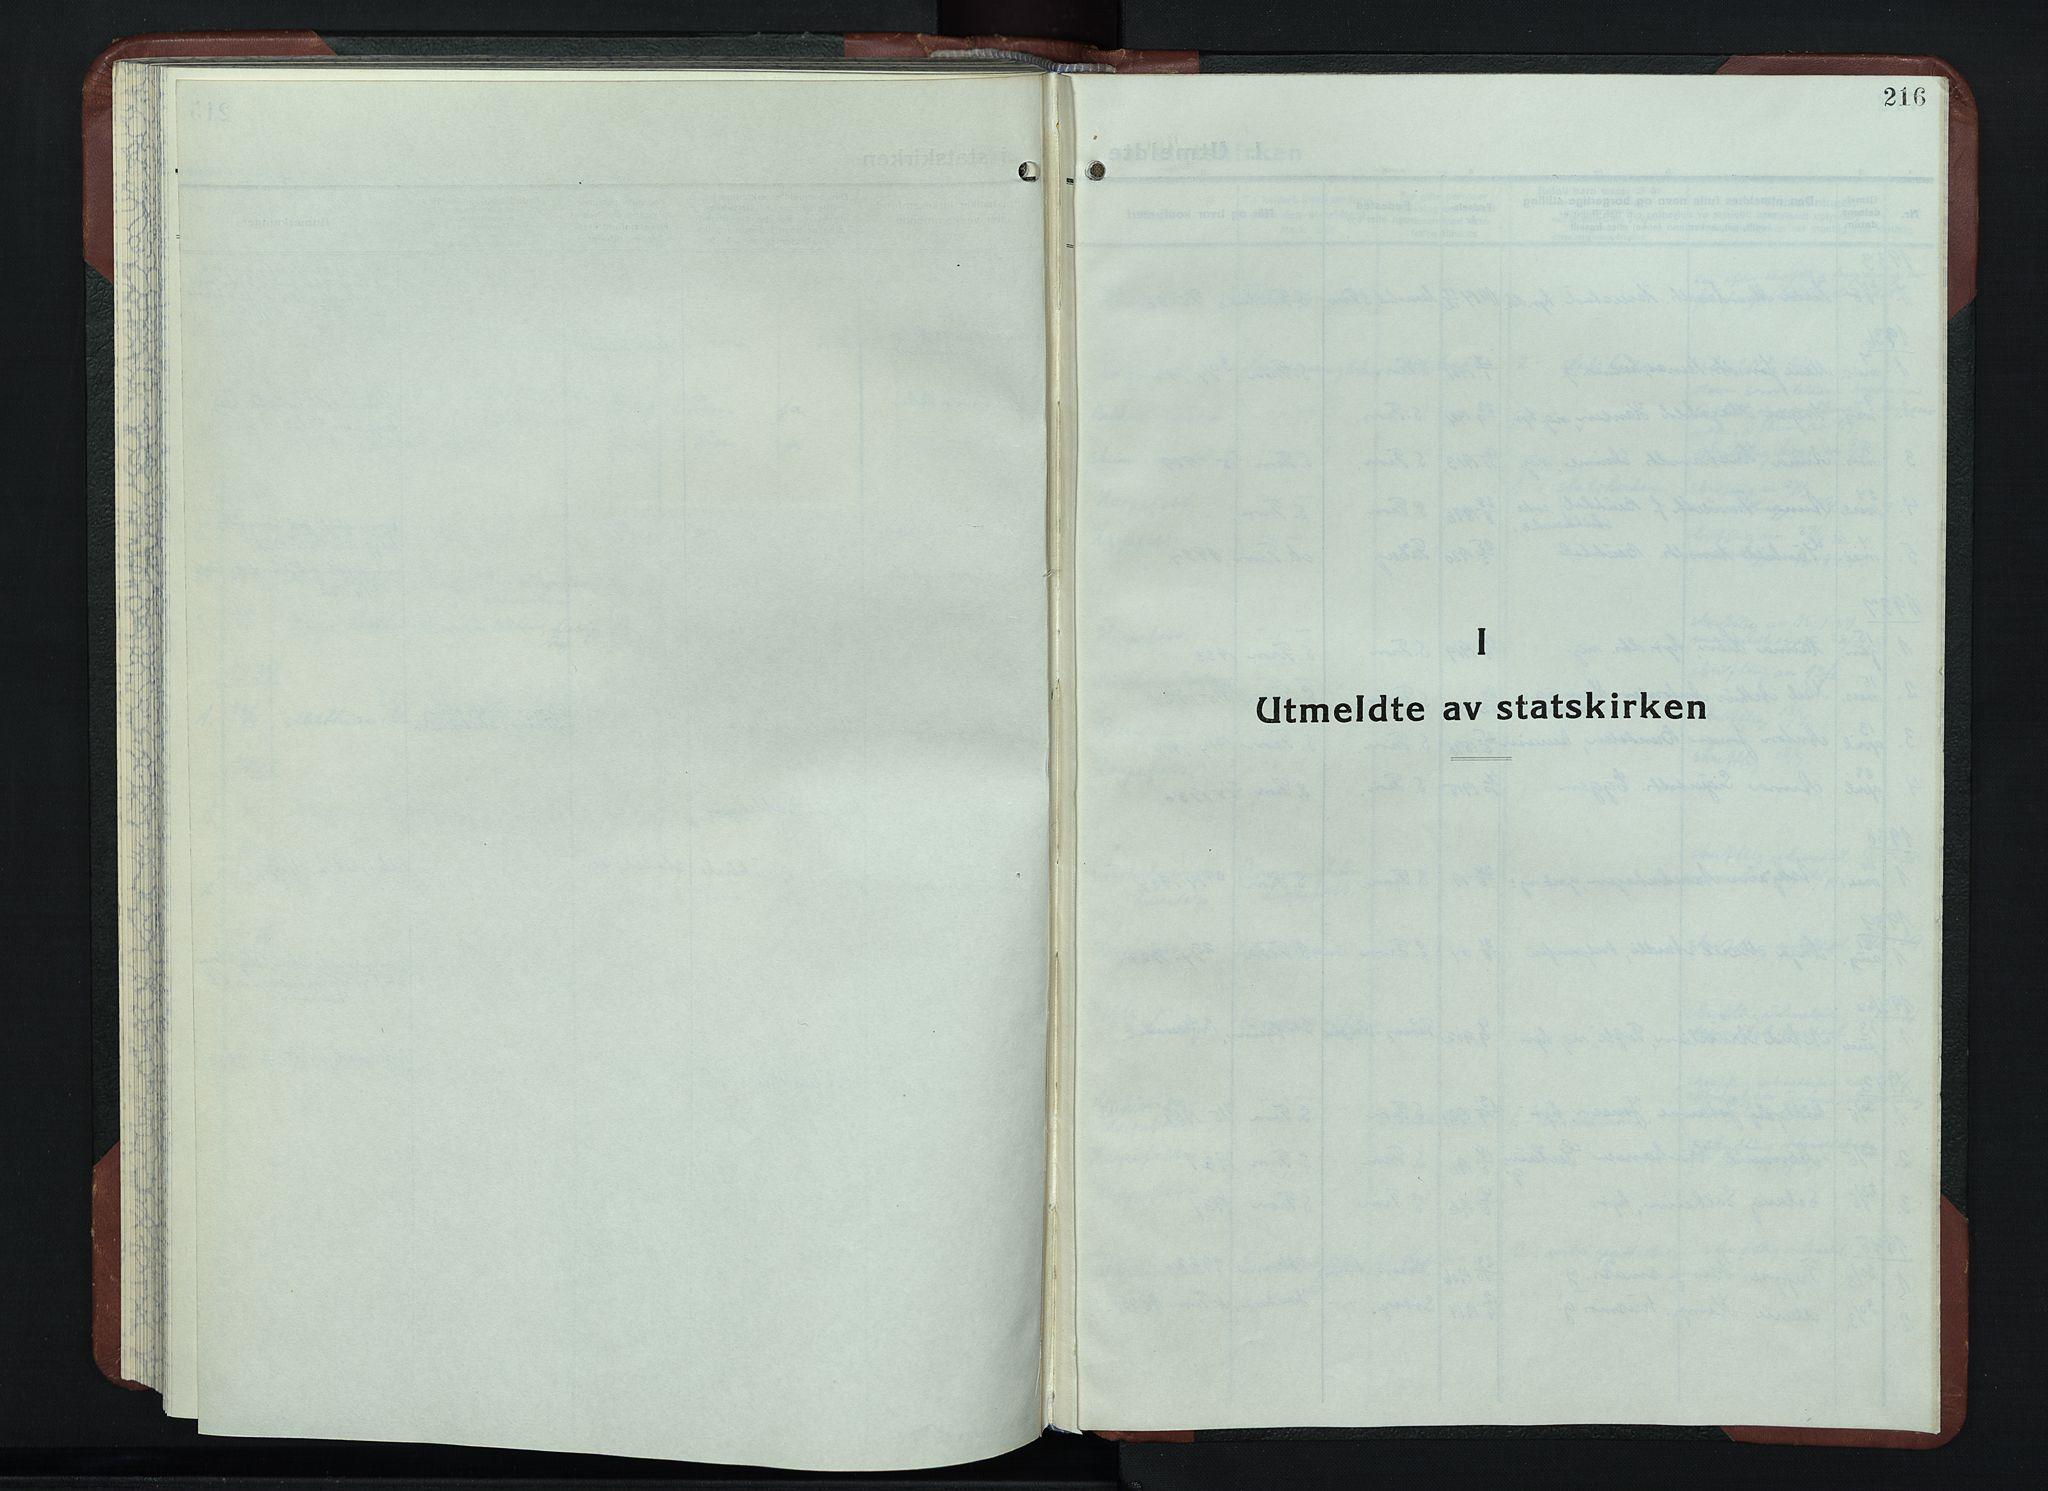 SAH, Sør-Fron prestekontor, H/Ha/Hab/L0006: Klokkerbok nr. 6, 1933-1948, s. 216